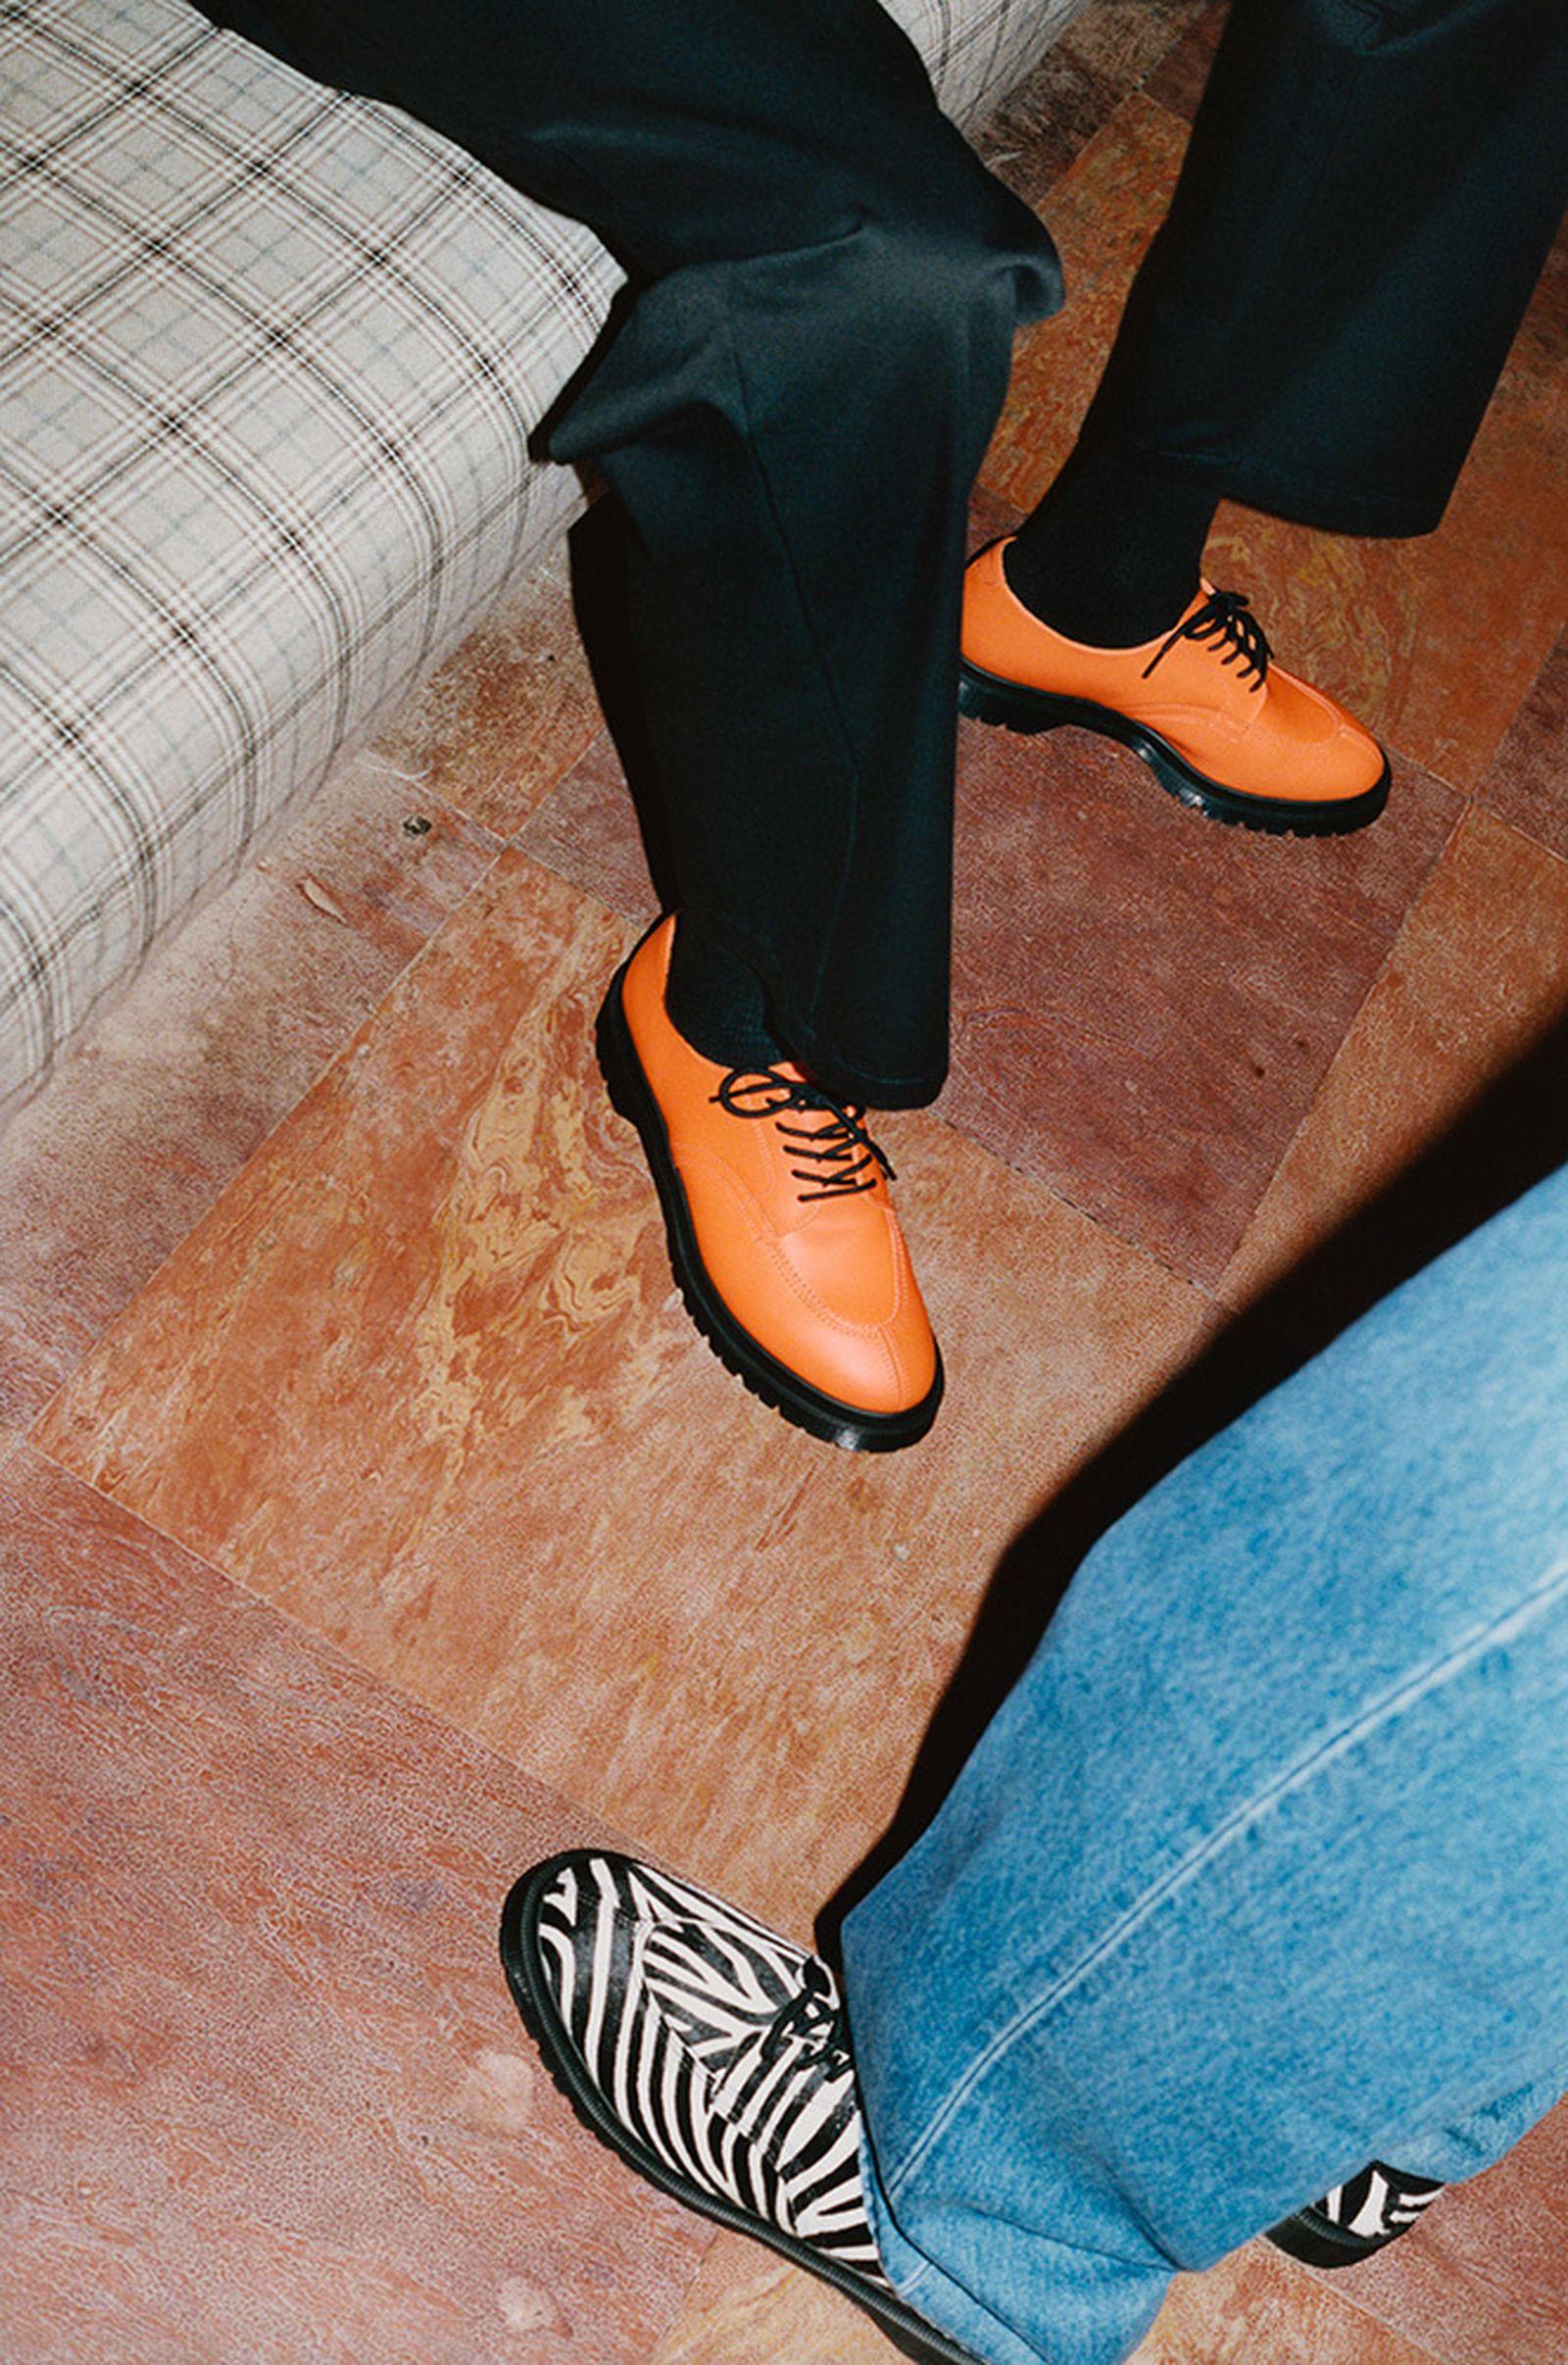 supreme-dr-martens-5-eye-shoe-release-date-price-03